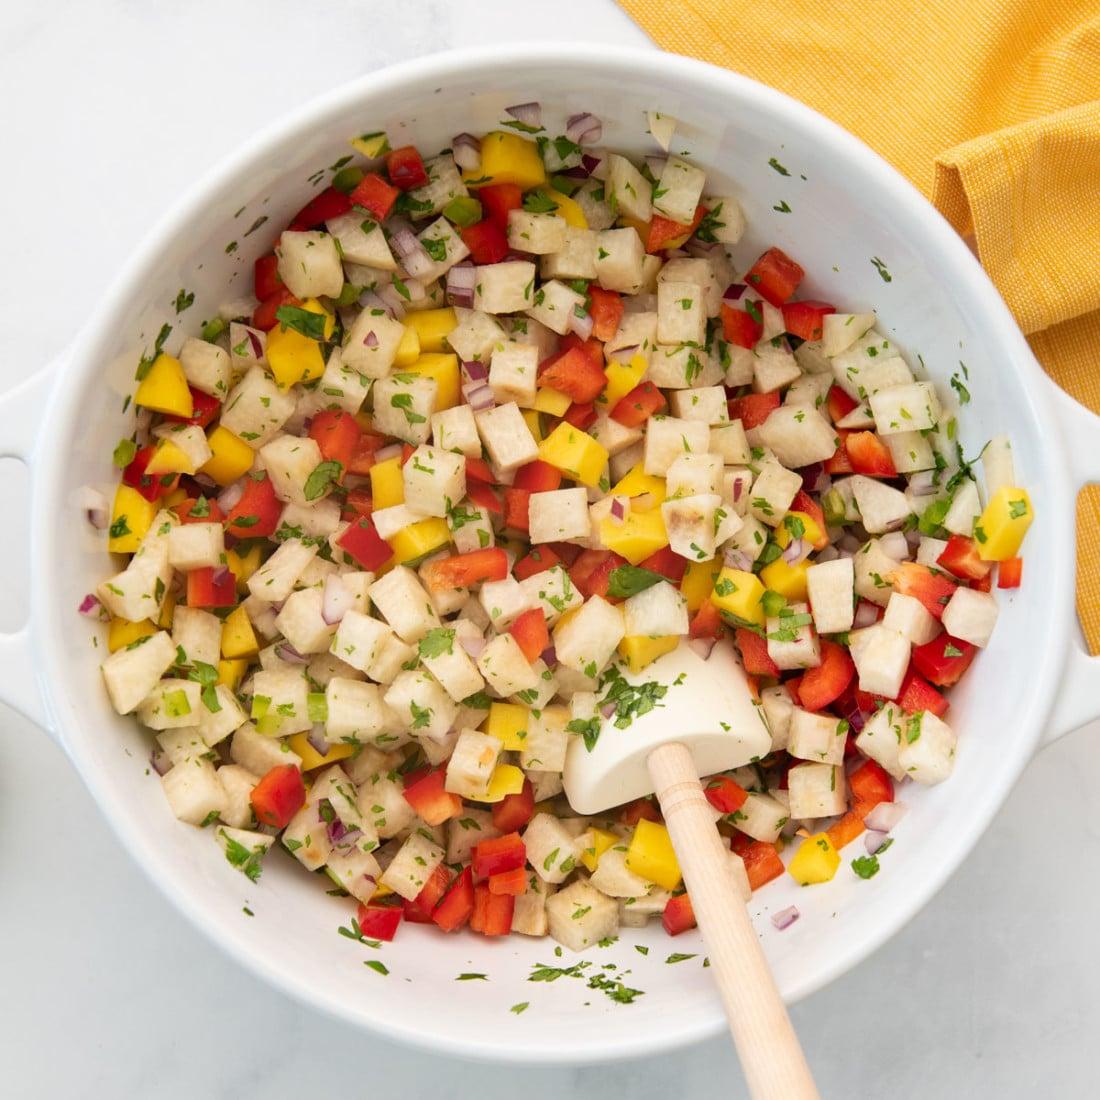 bowl with combined jicama salsa and a spatula